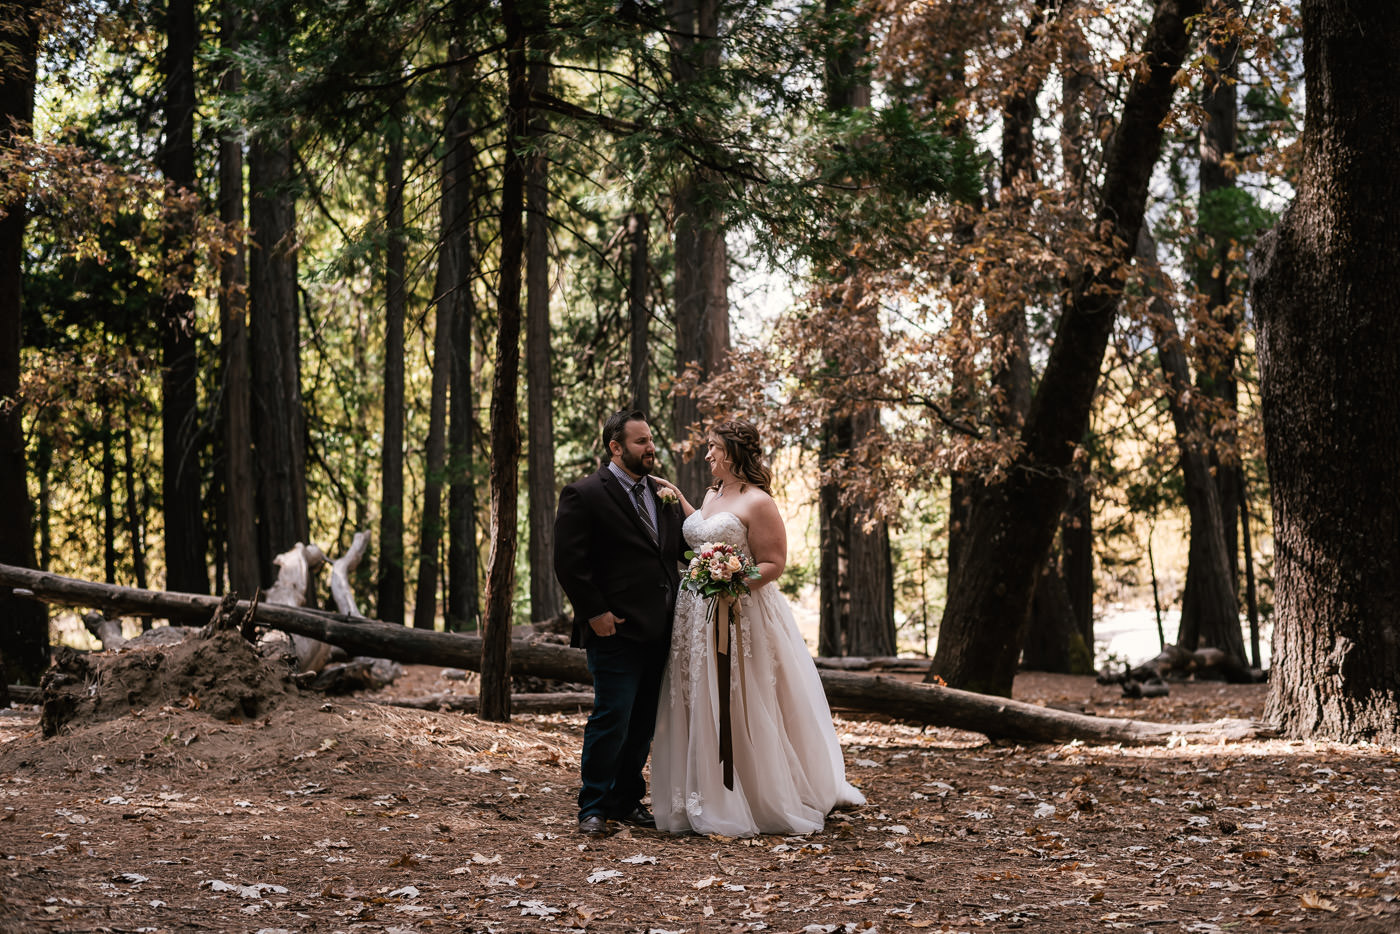 yosemite-swinging-bridge-first-look-wedding-11.jpg